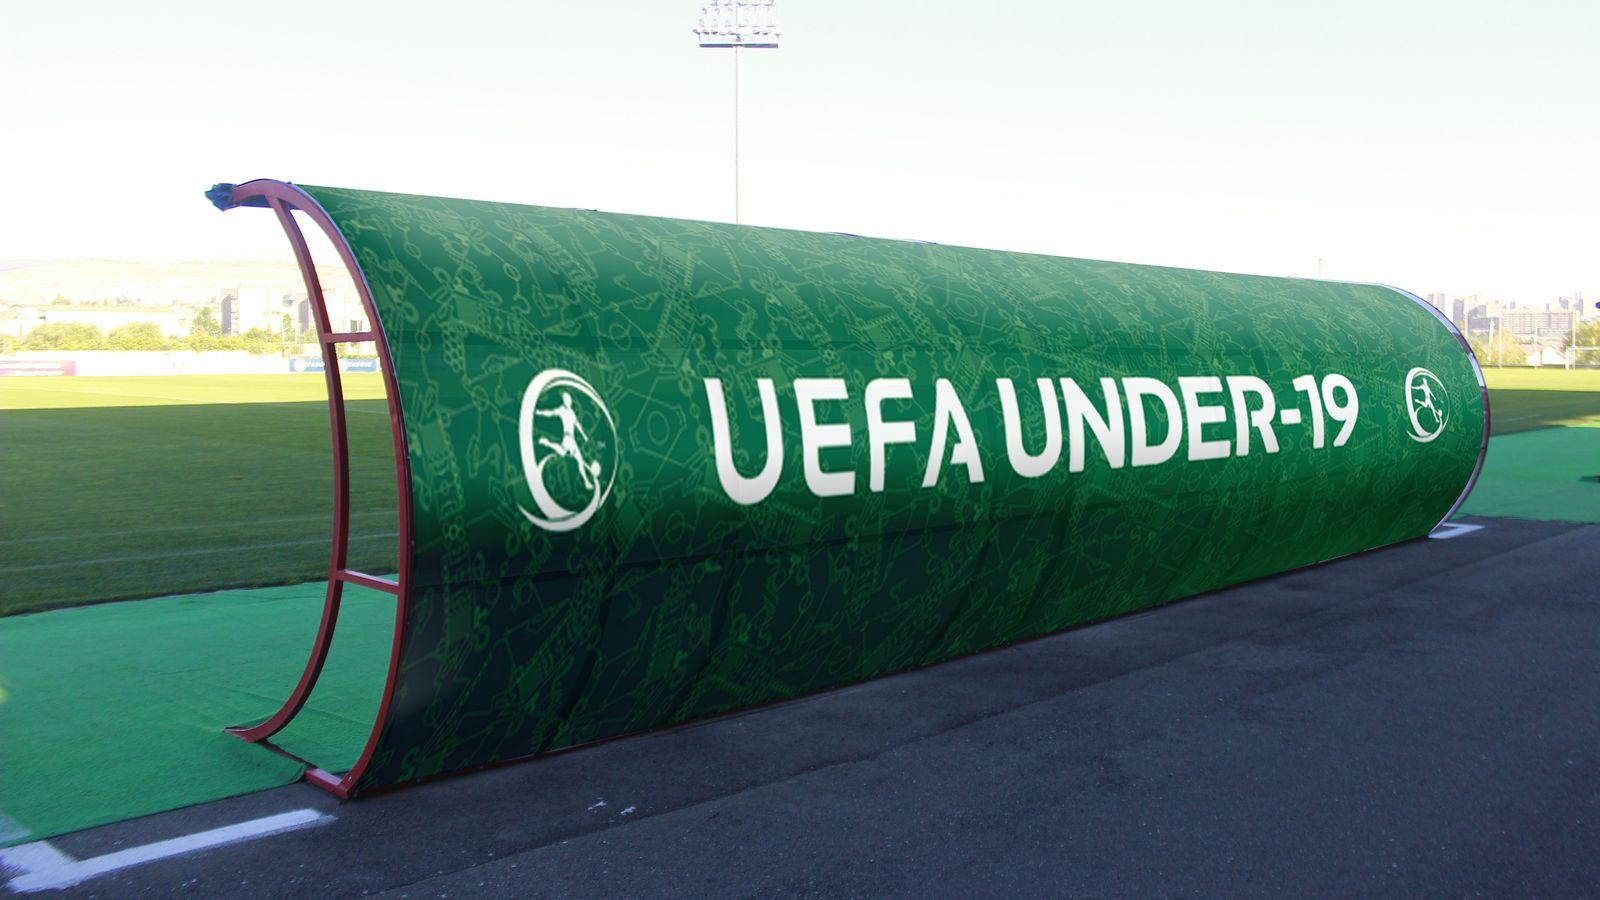 Uefa soccer canopy banner